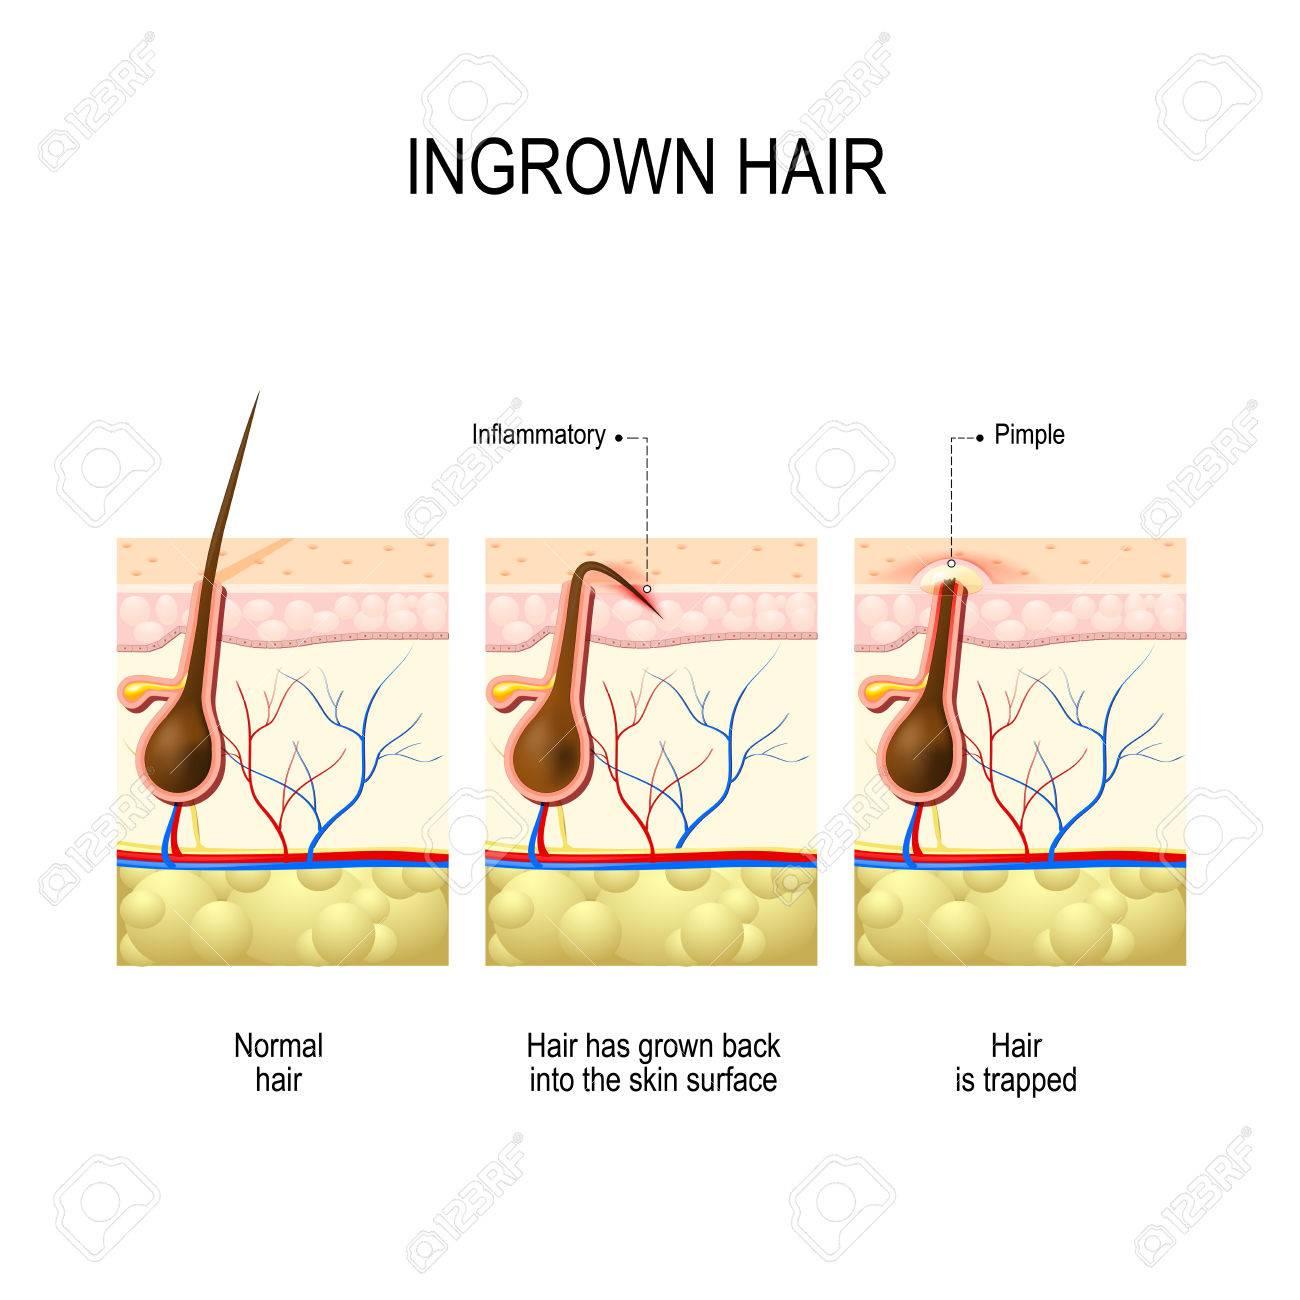 http://n3.datasn.io/data/api/v1/n3zm/image_of_skin_disease_5/main/skin_disease_image_download//7b/4b/da/0e/7b4bda0e4a869245aeca174d17b2c2e245e1eba4.jpg